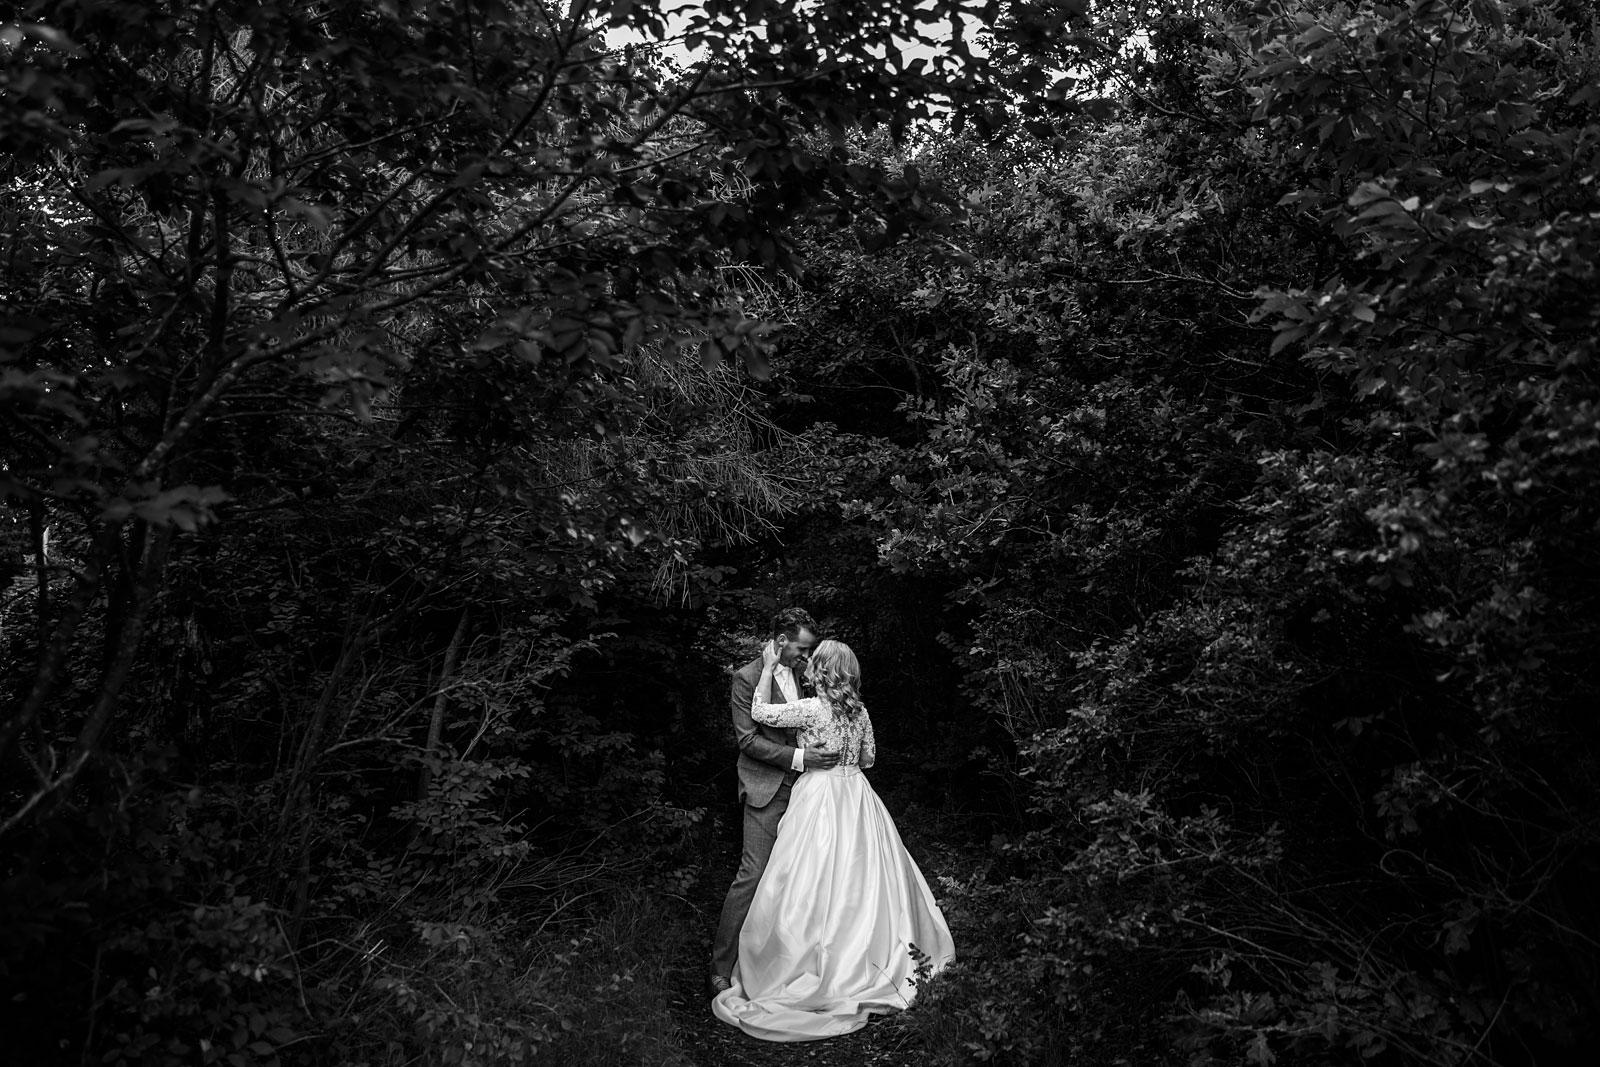 22-fotoshoot-trouwfotografie